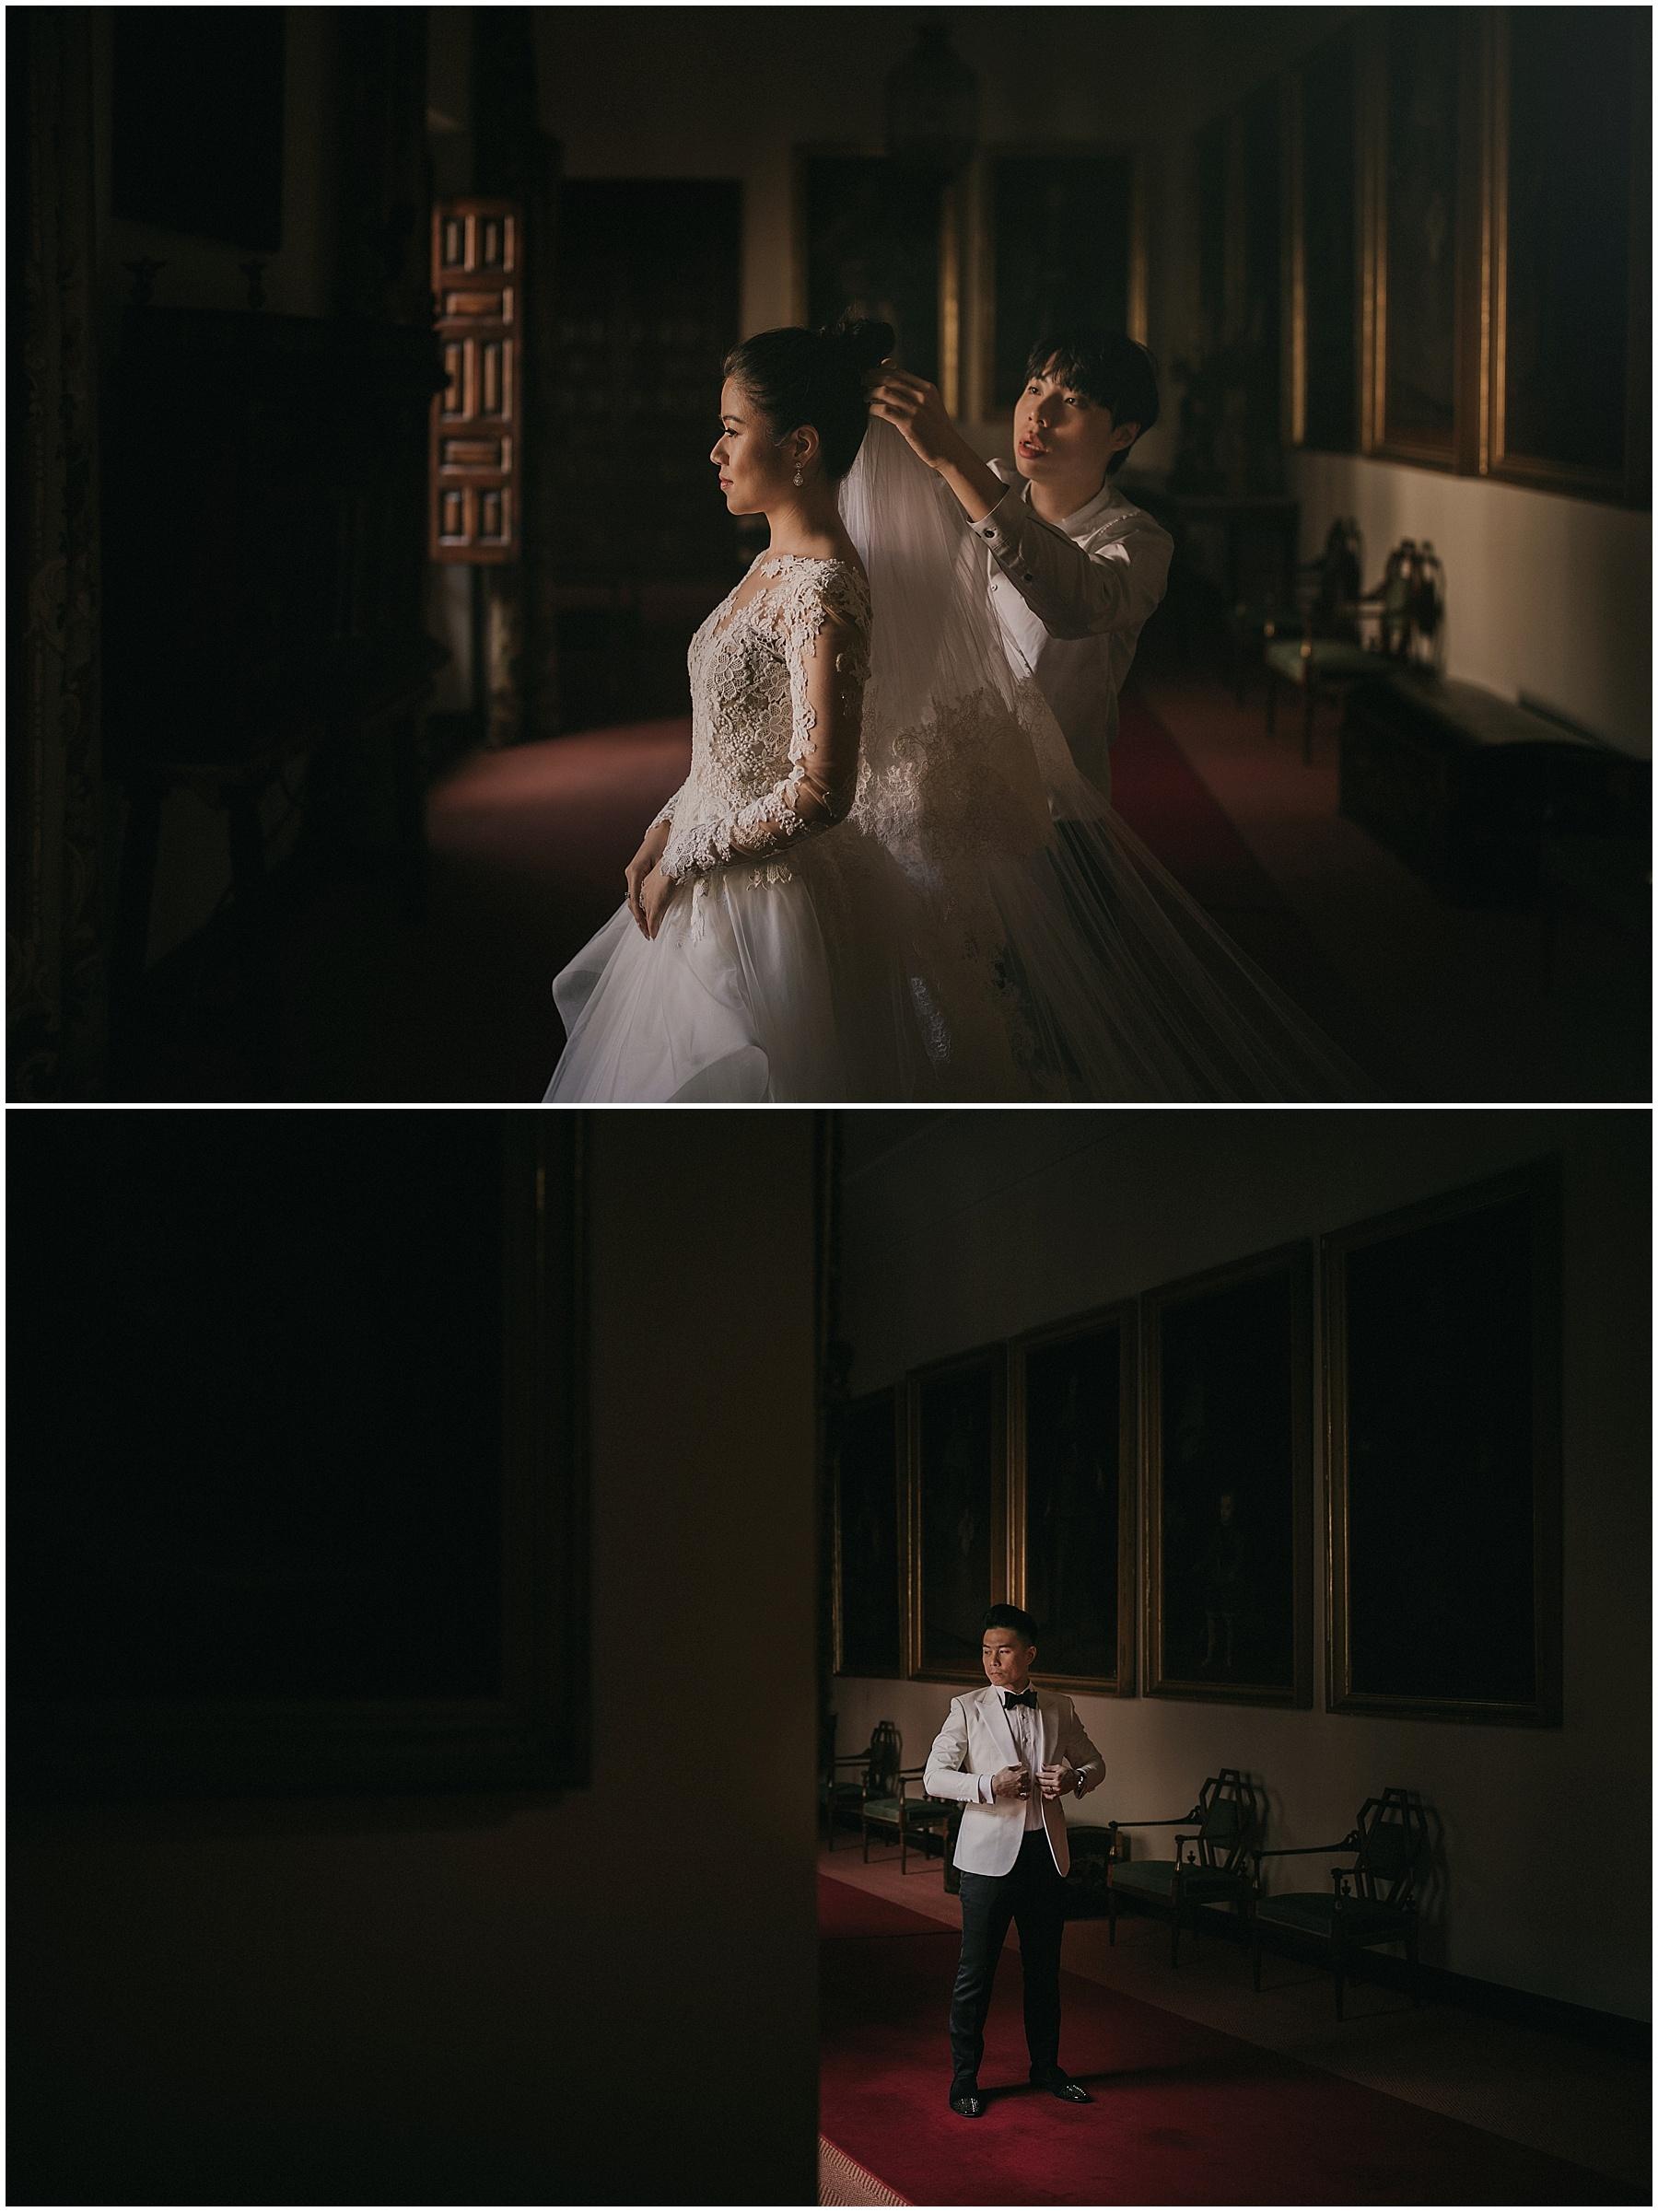 Malaysia wedding 008.JPG